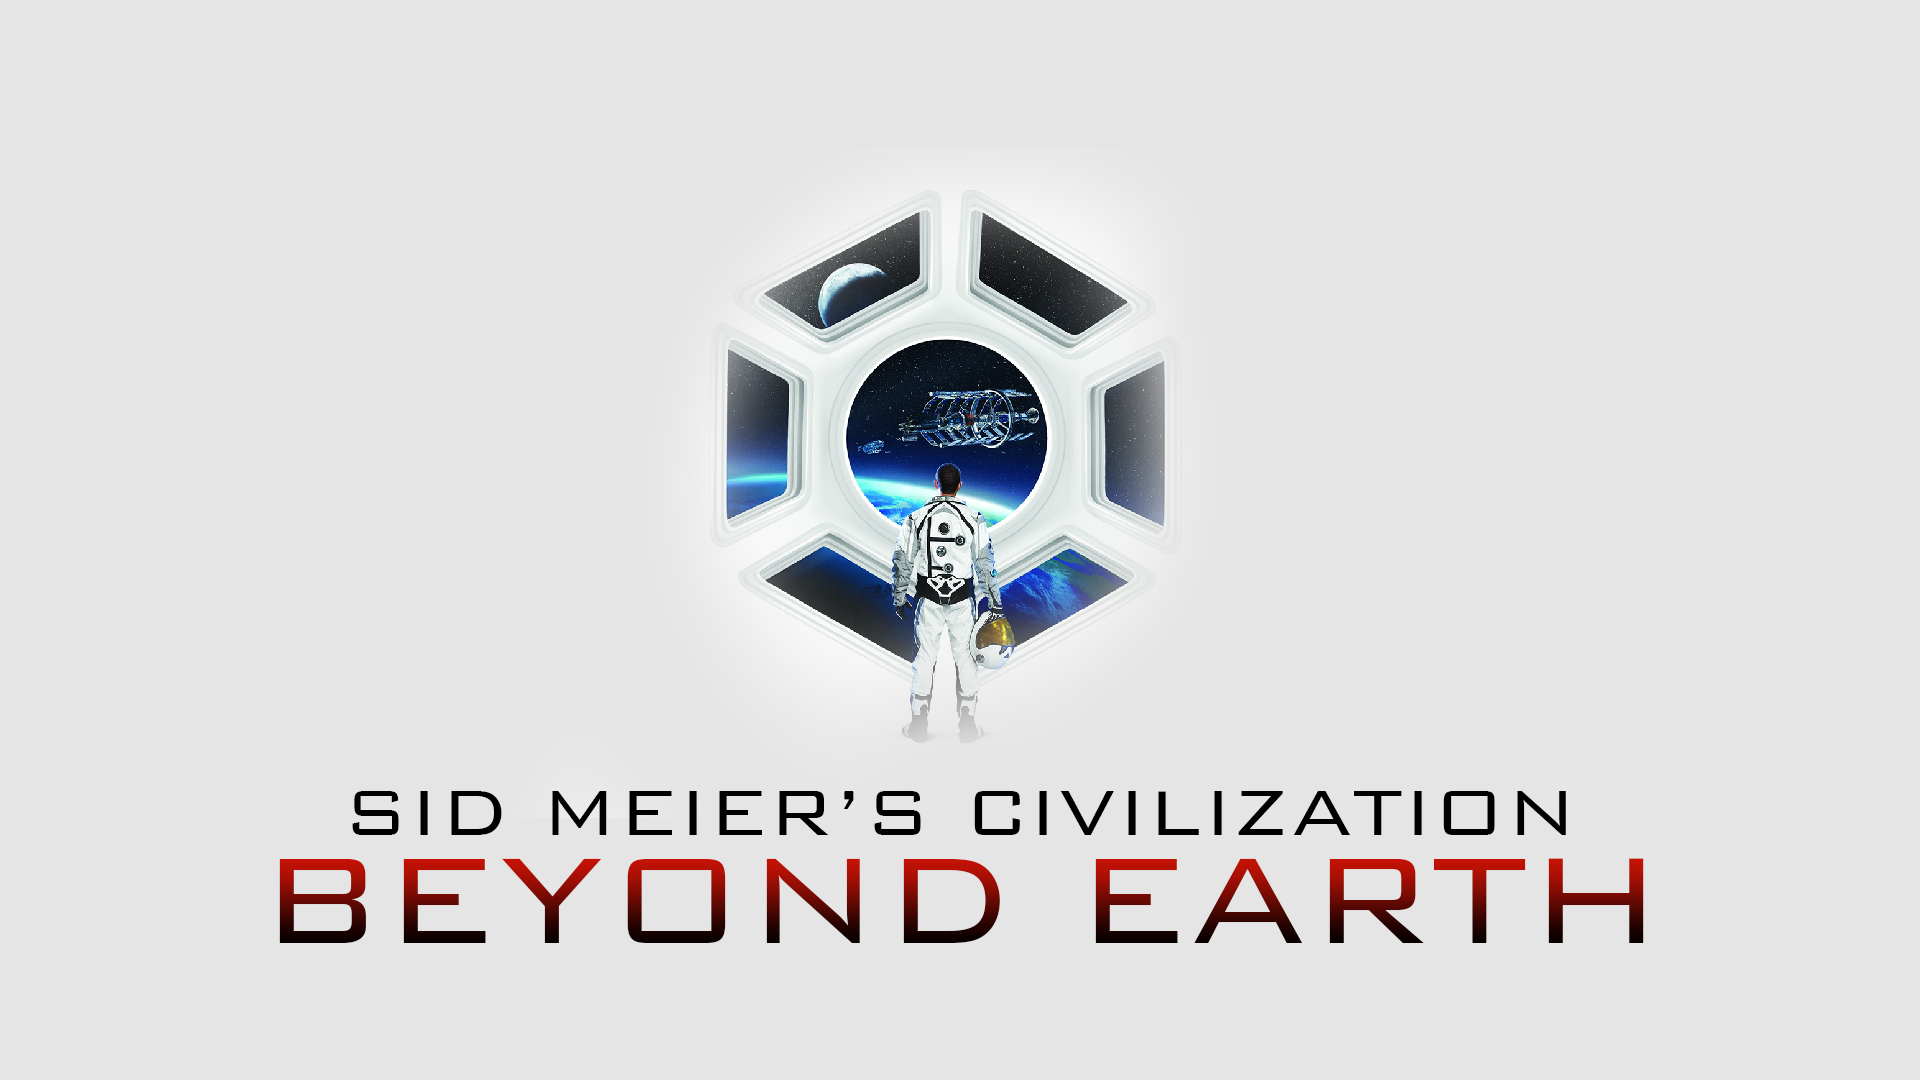 How To Fix Sid Meier's Civilization Beyond Earth Errors